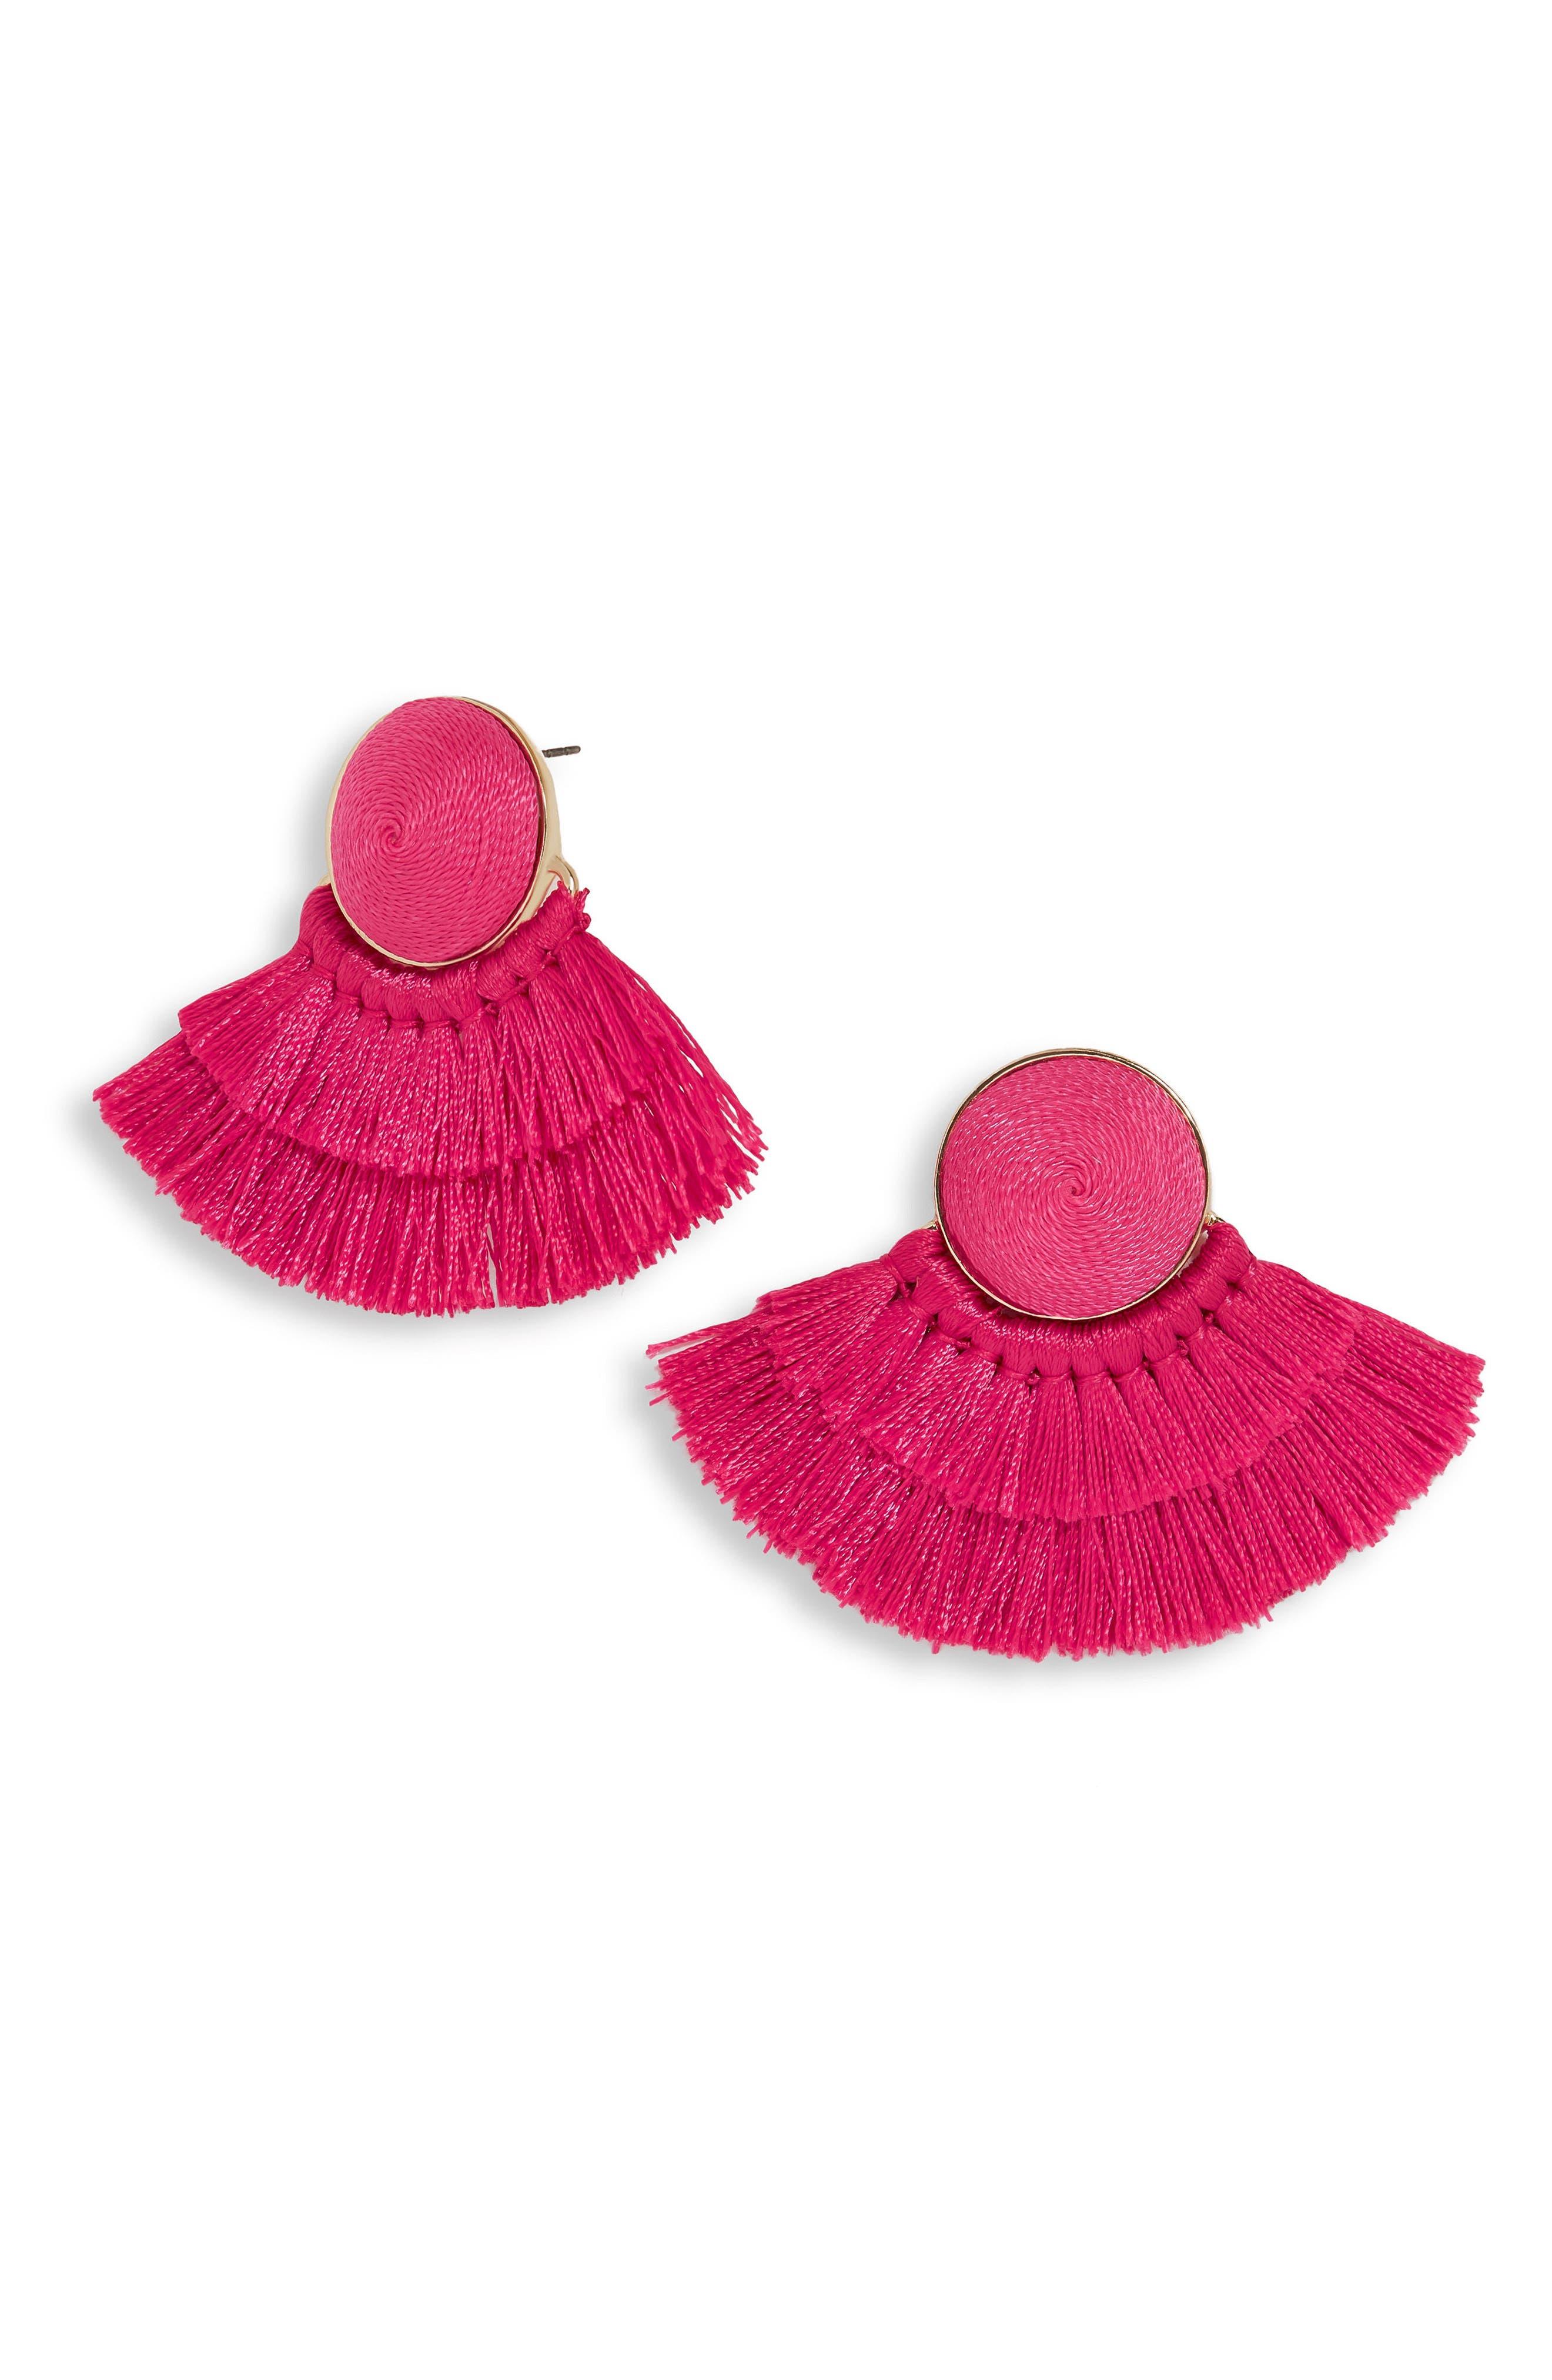 Martina Chubby Deco Fringe Drop Earrings,                             Main thumbnail 1, color,                             Fuchsia